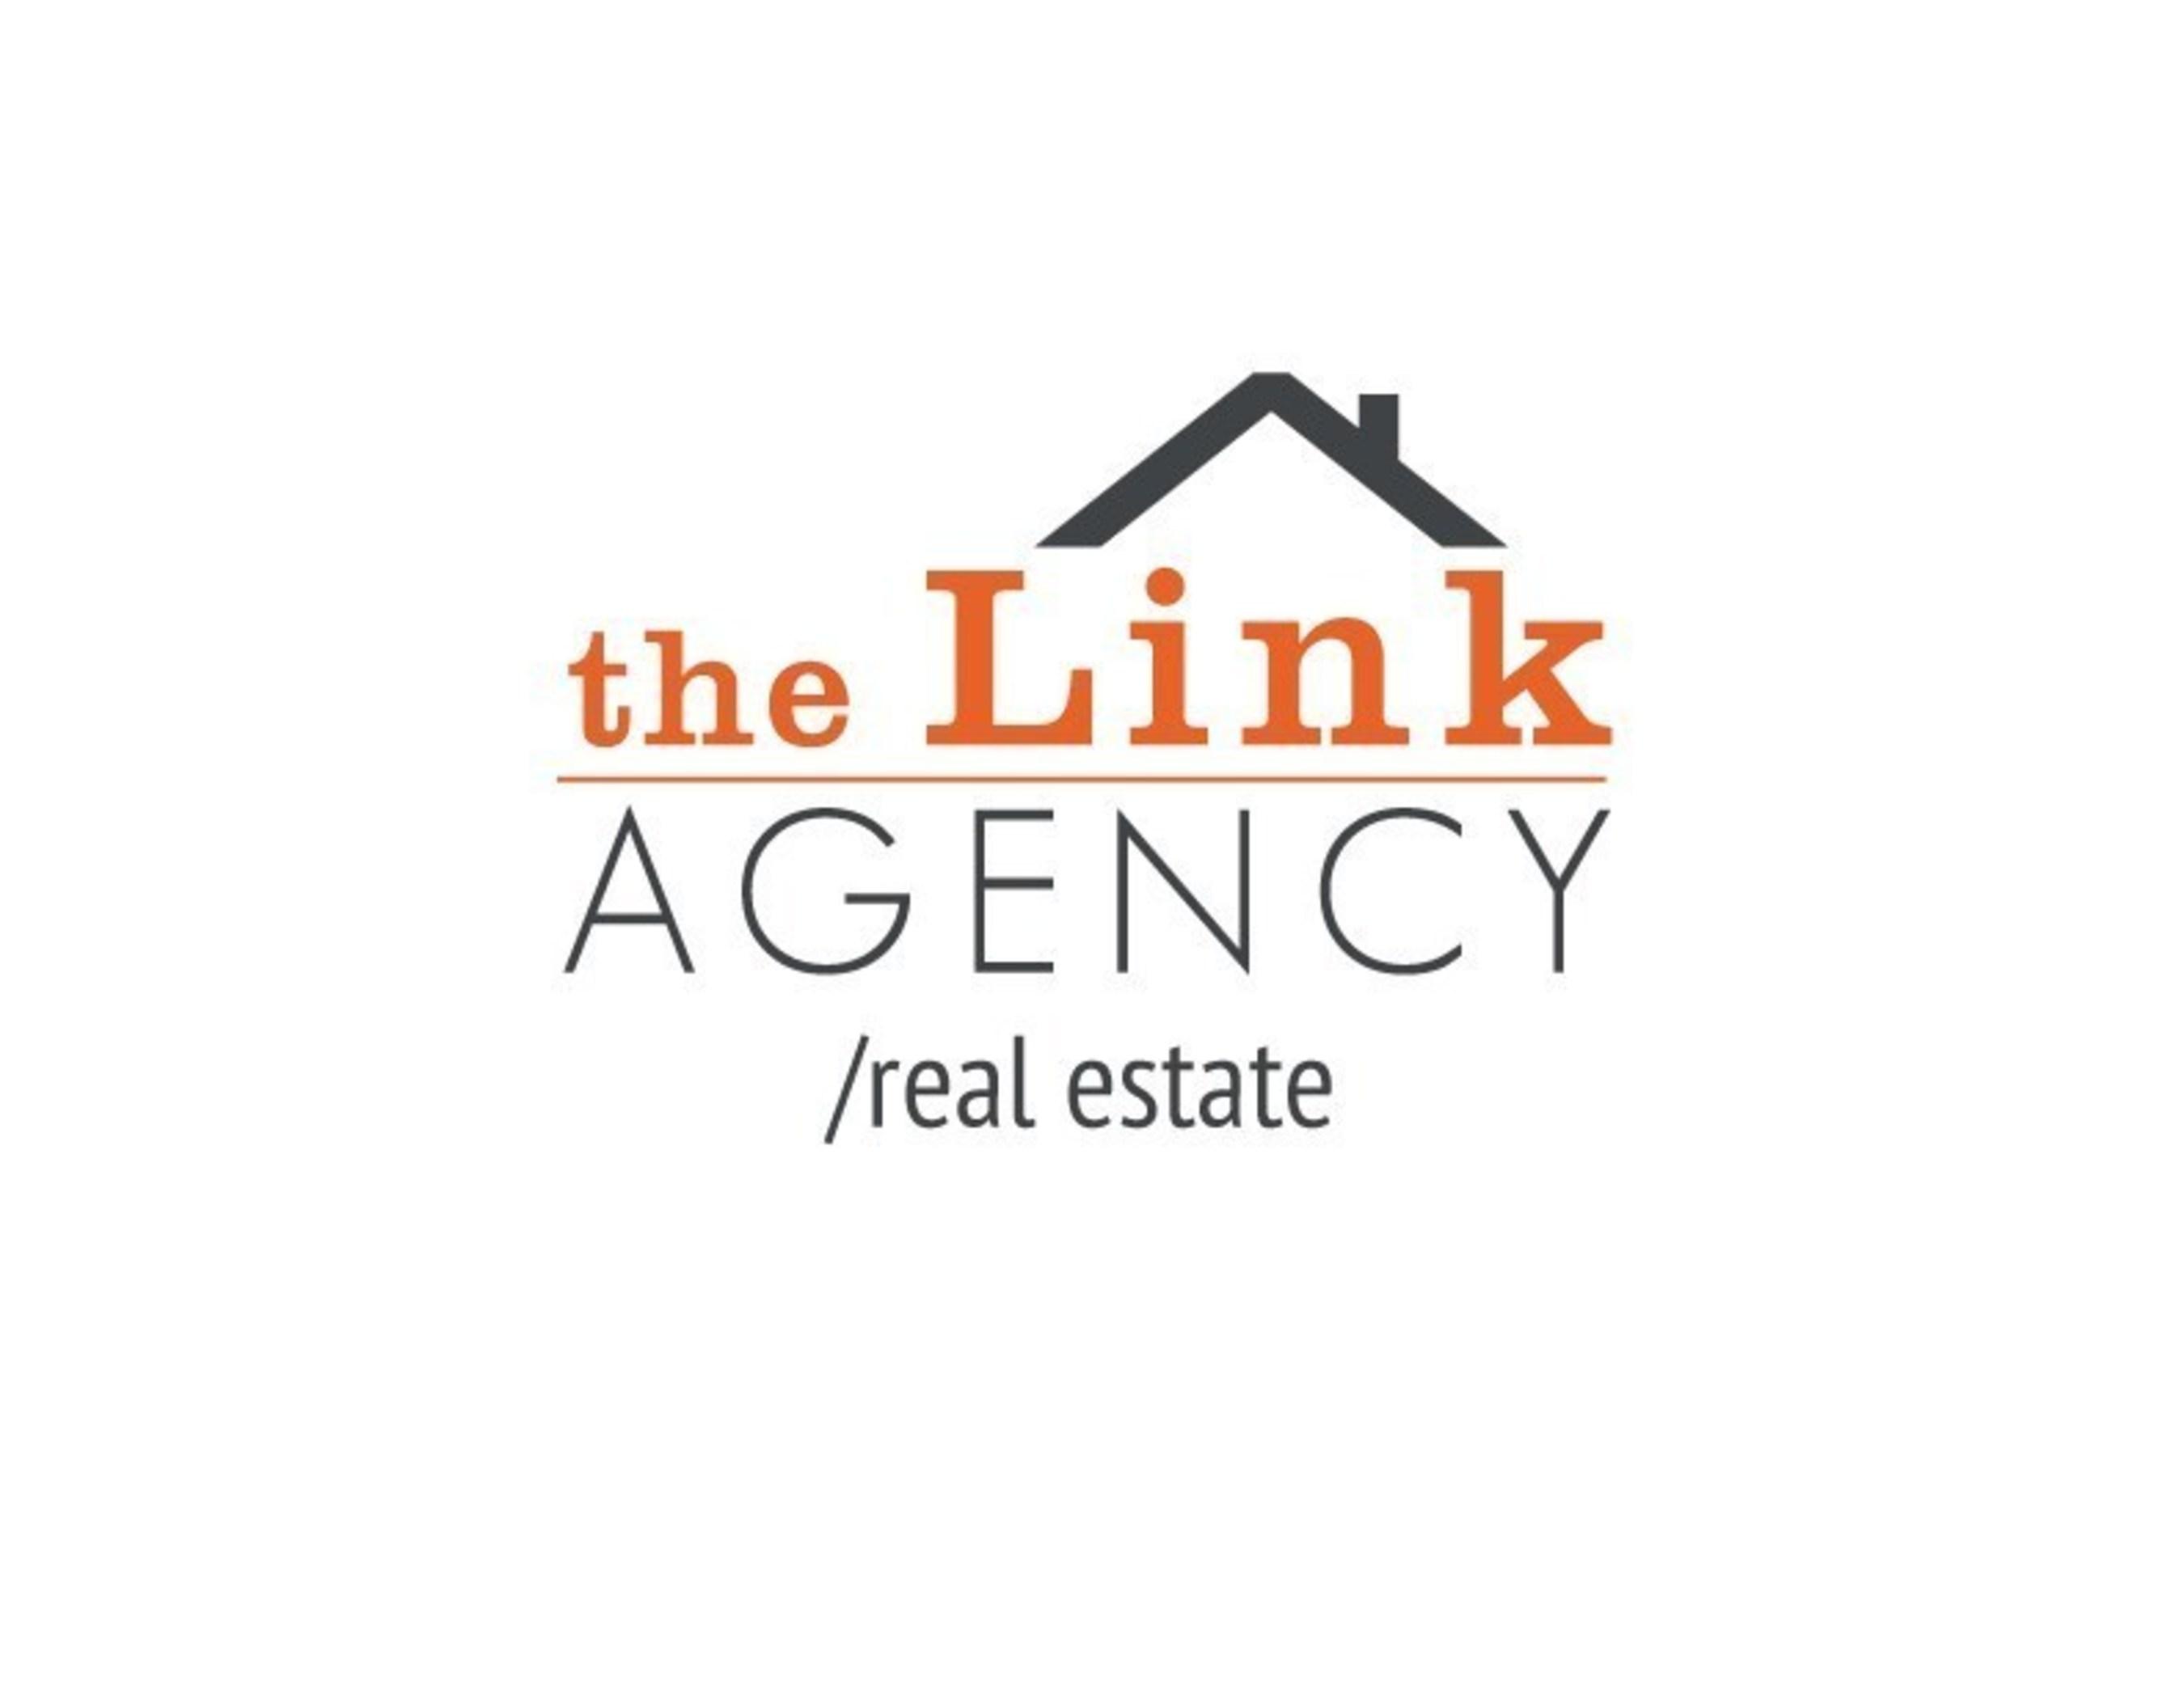 The Link Agency logo